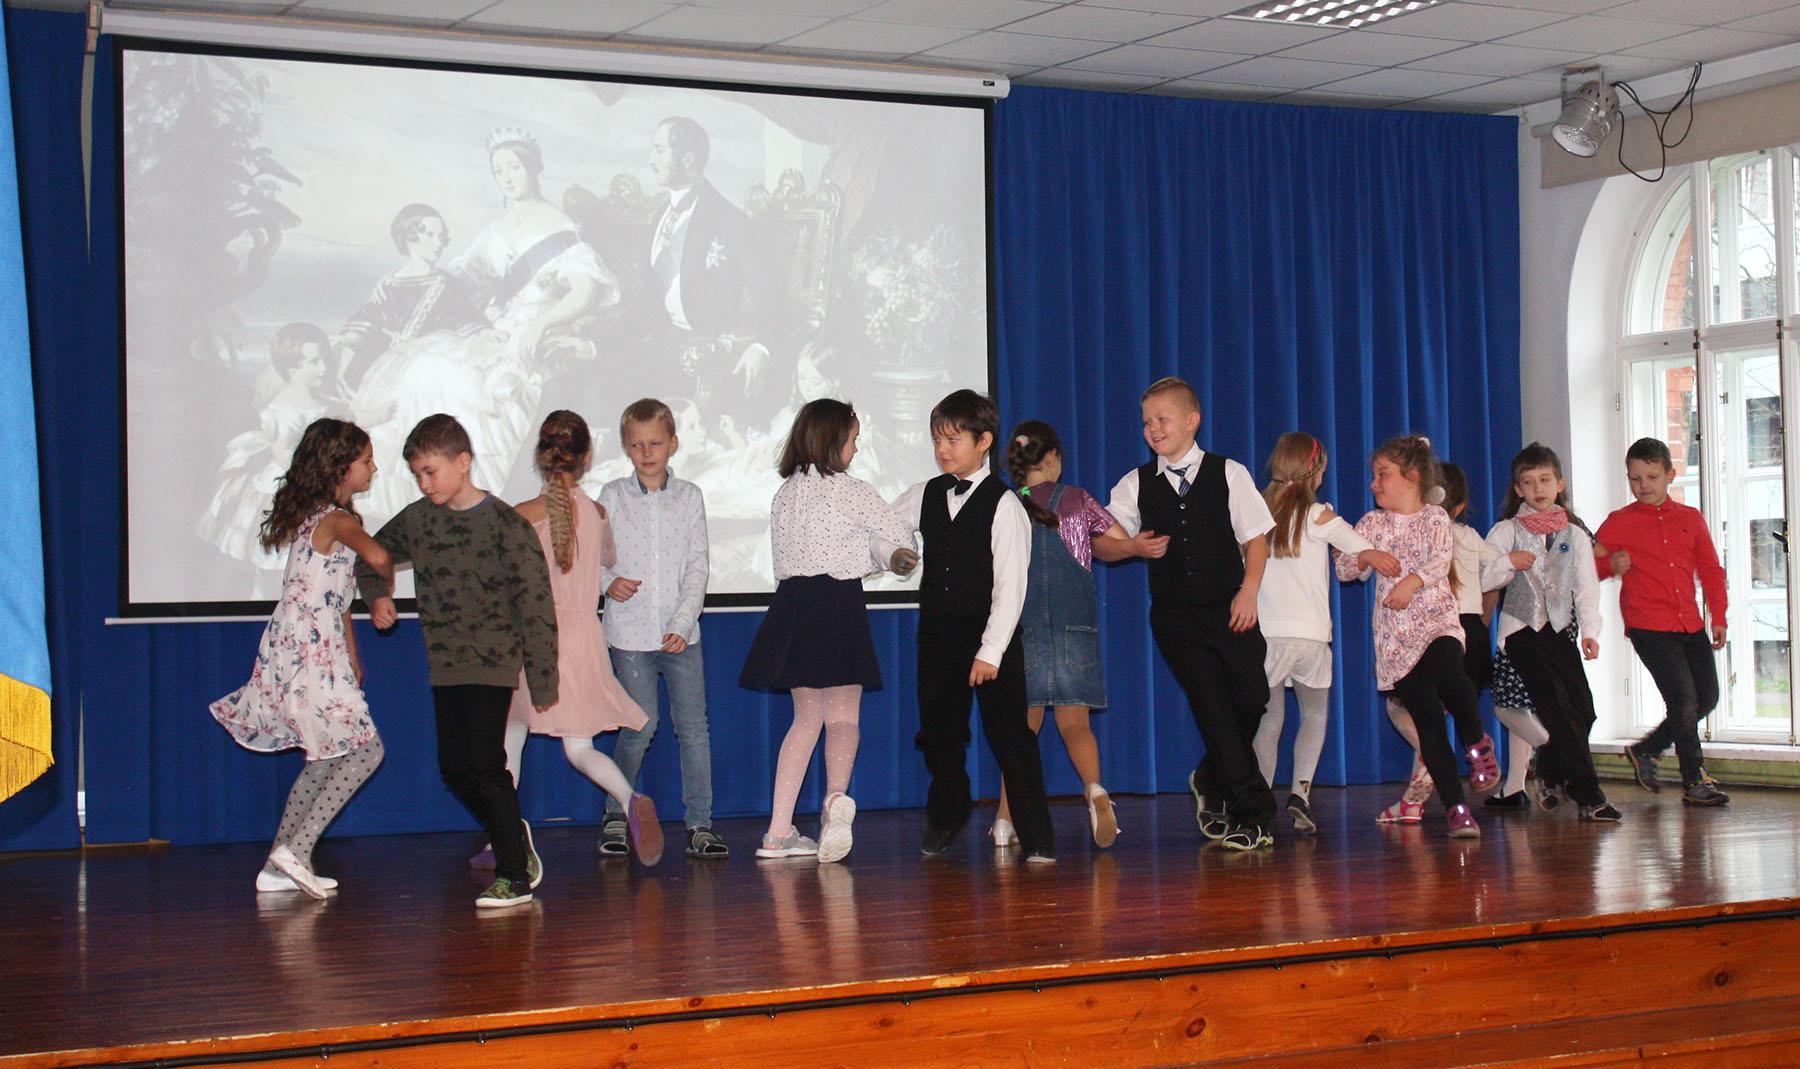 Maakondlik Briti päev Sindi gümnaasiumis. Foto Maris Voltein